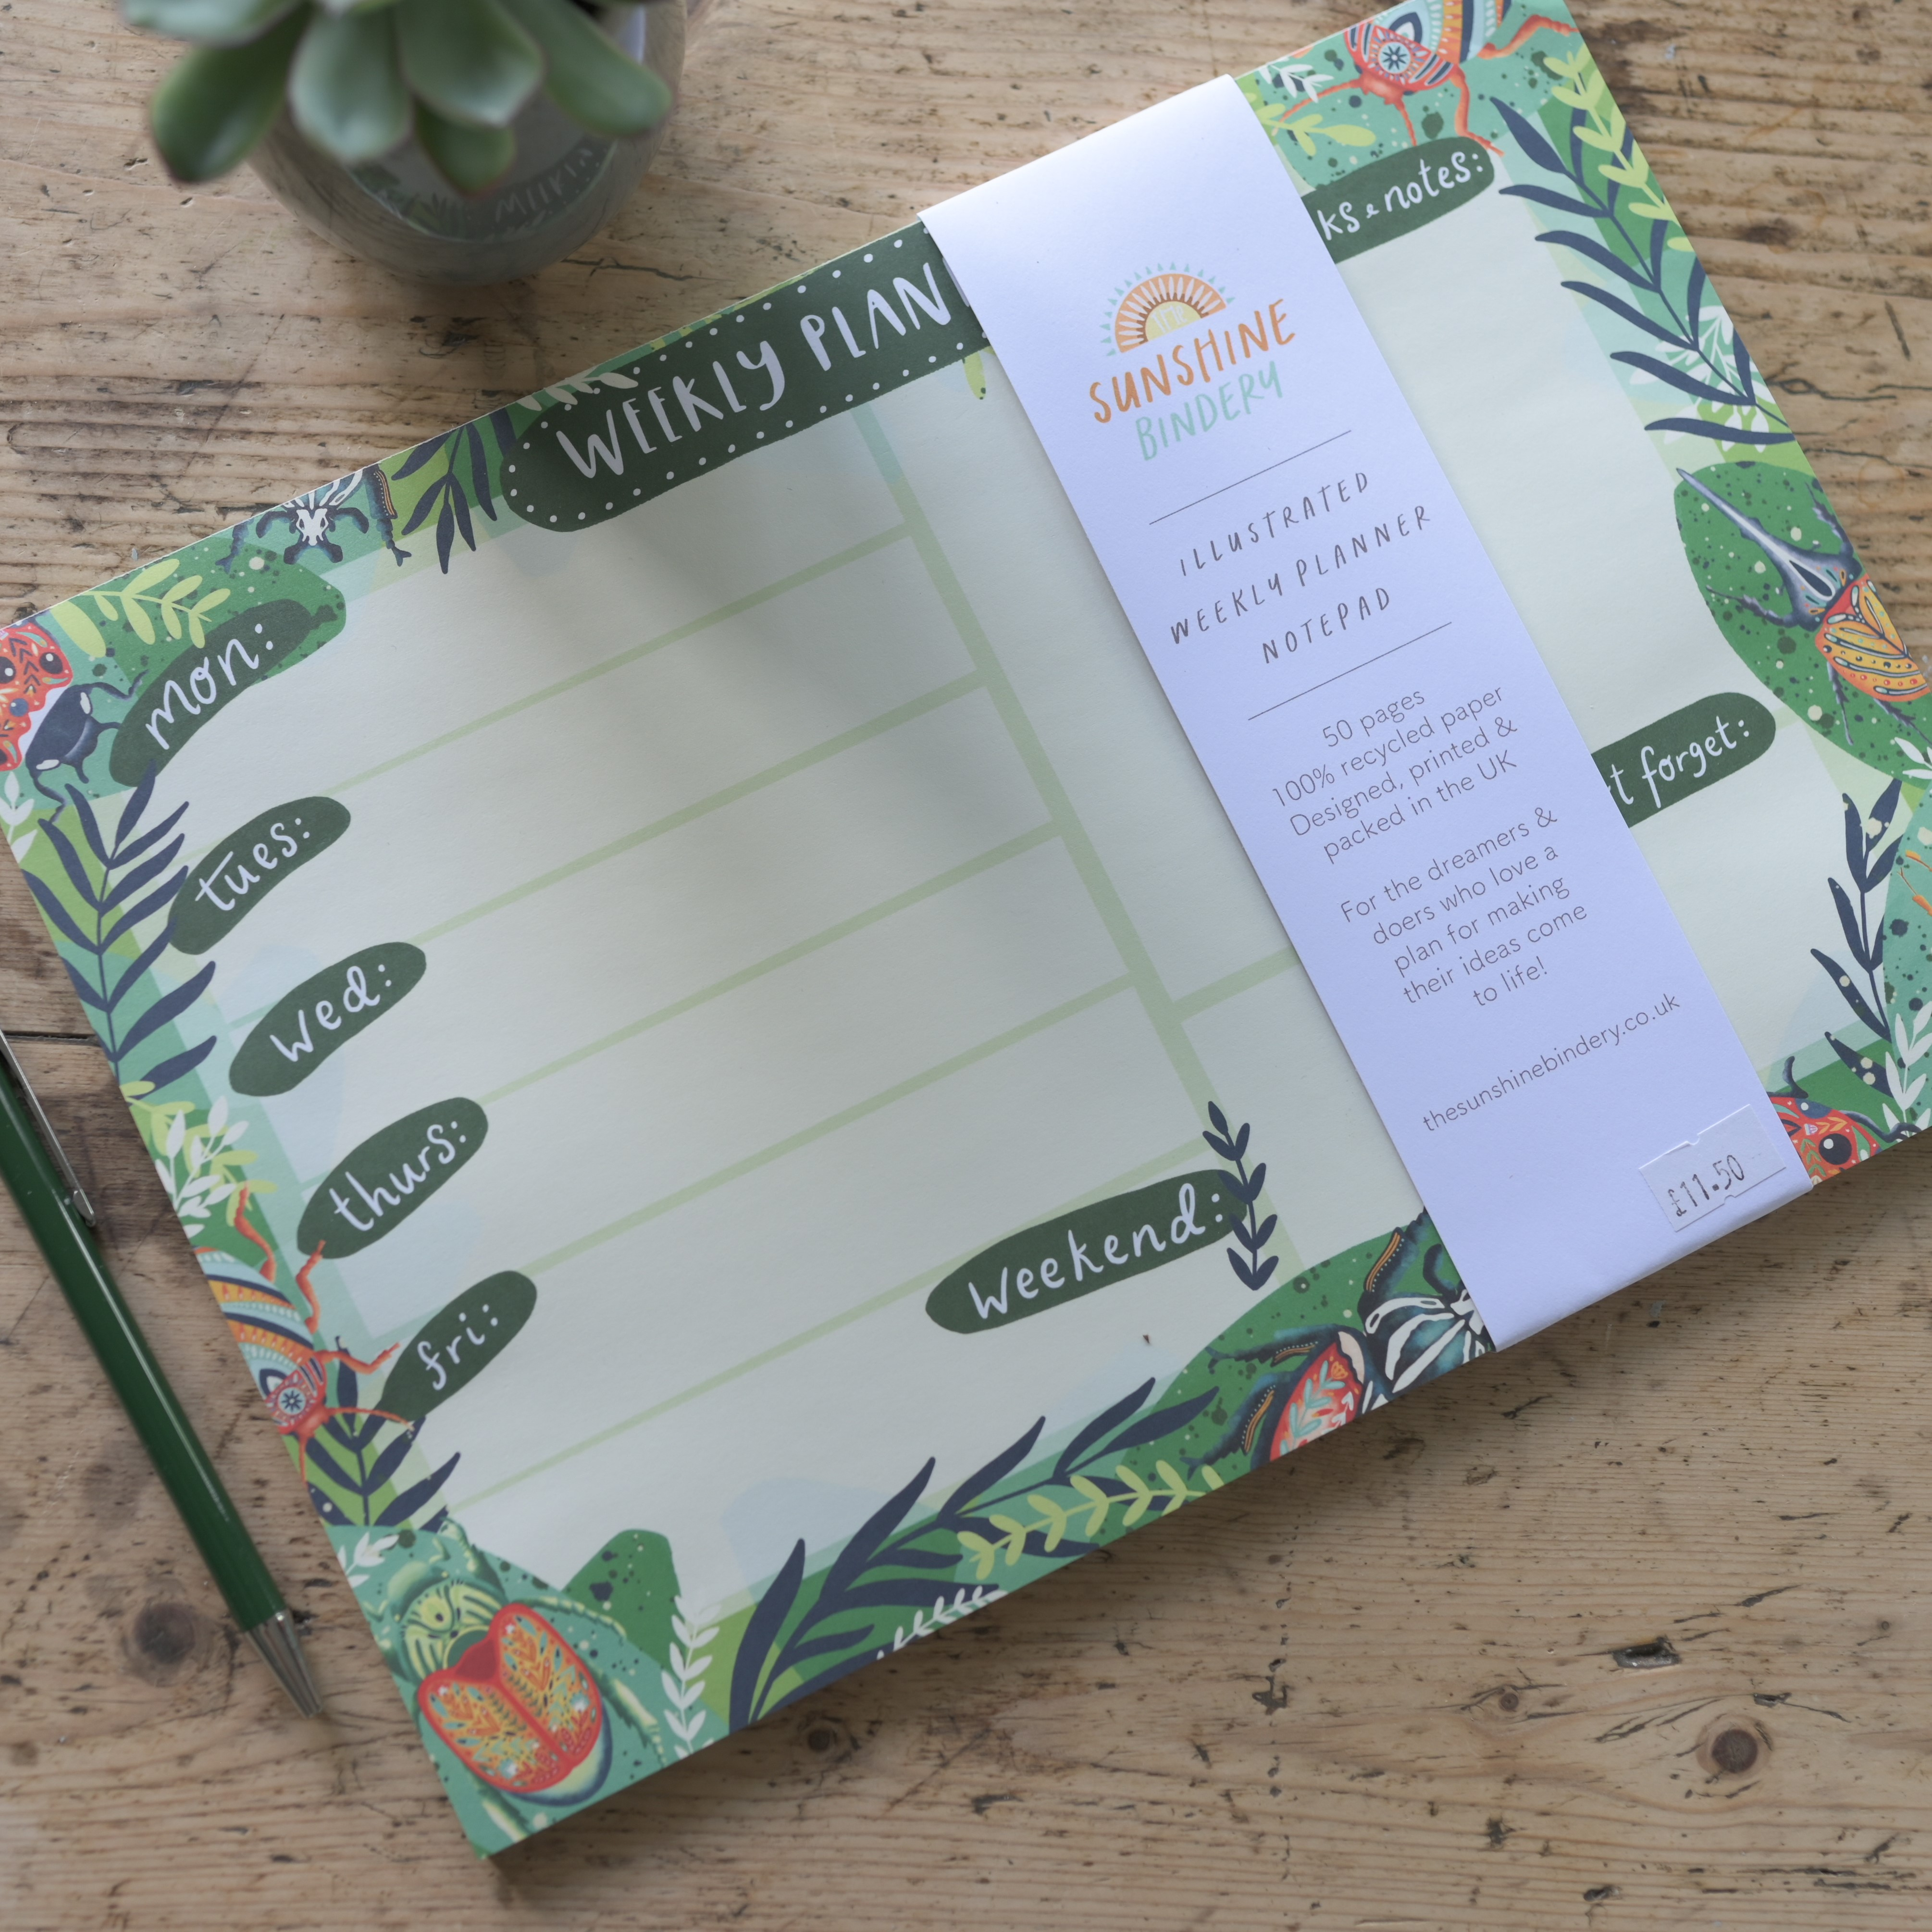 Weekly Planner, The Sunshine Bindery